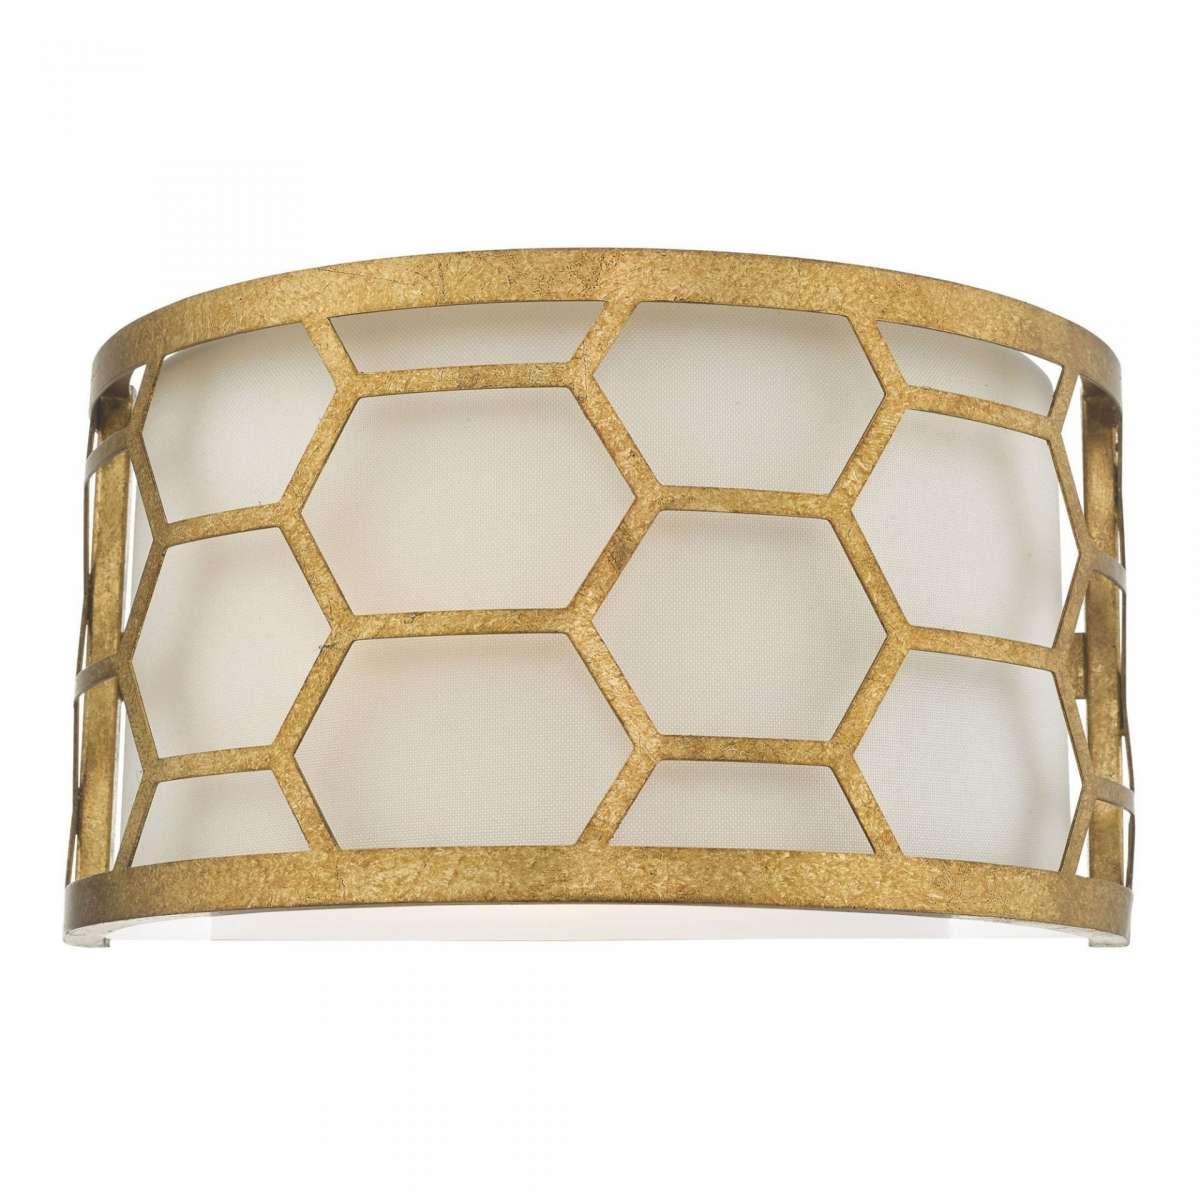 Epstein 1 Light Wall Light Gold & Ivory